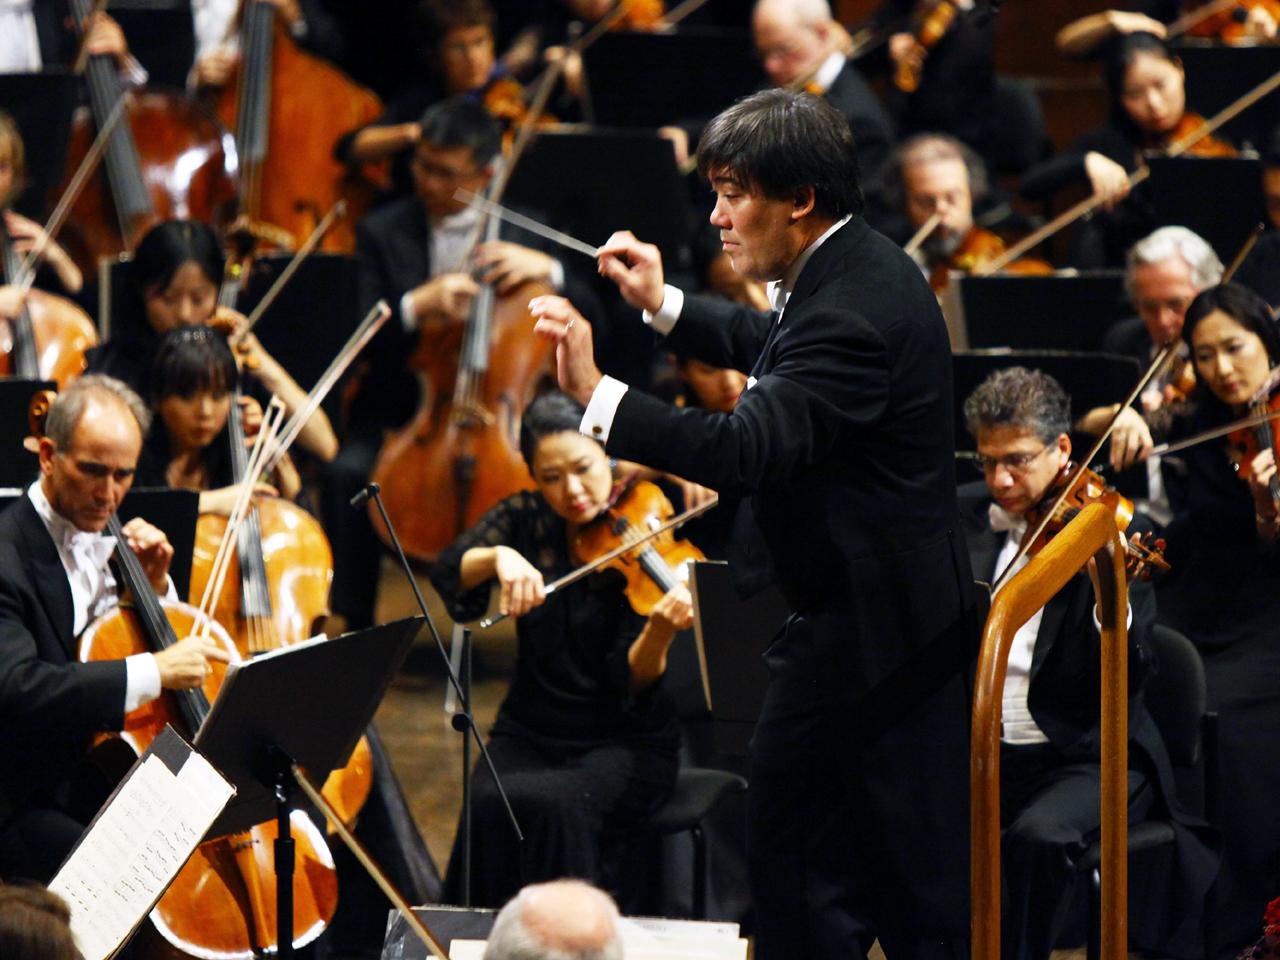 Maestro Alan Gilbert na Orquestra Filarmônica de Nova York